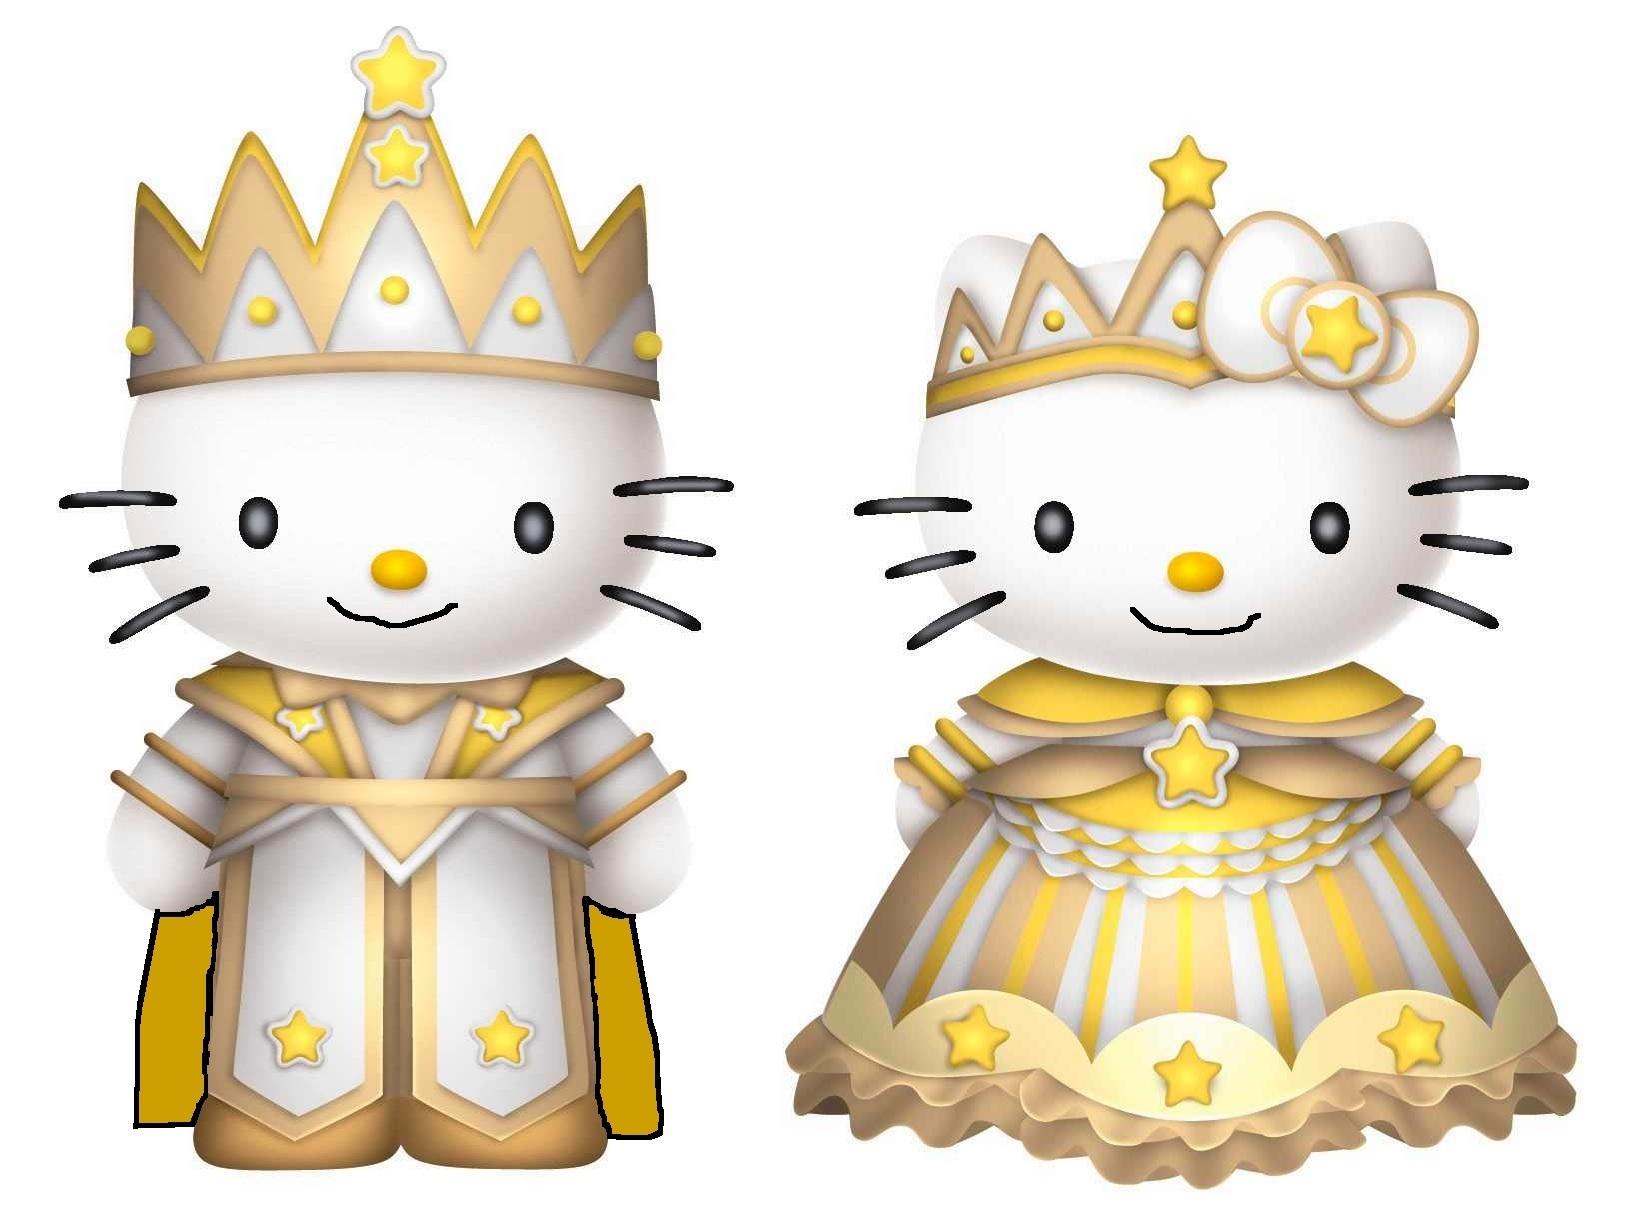 Prince Dear Daniel And Princess Kitty